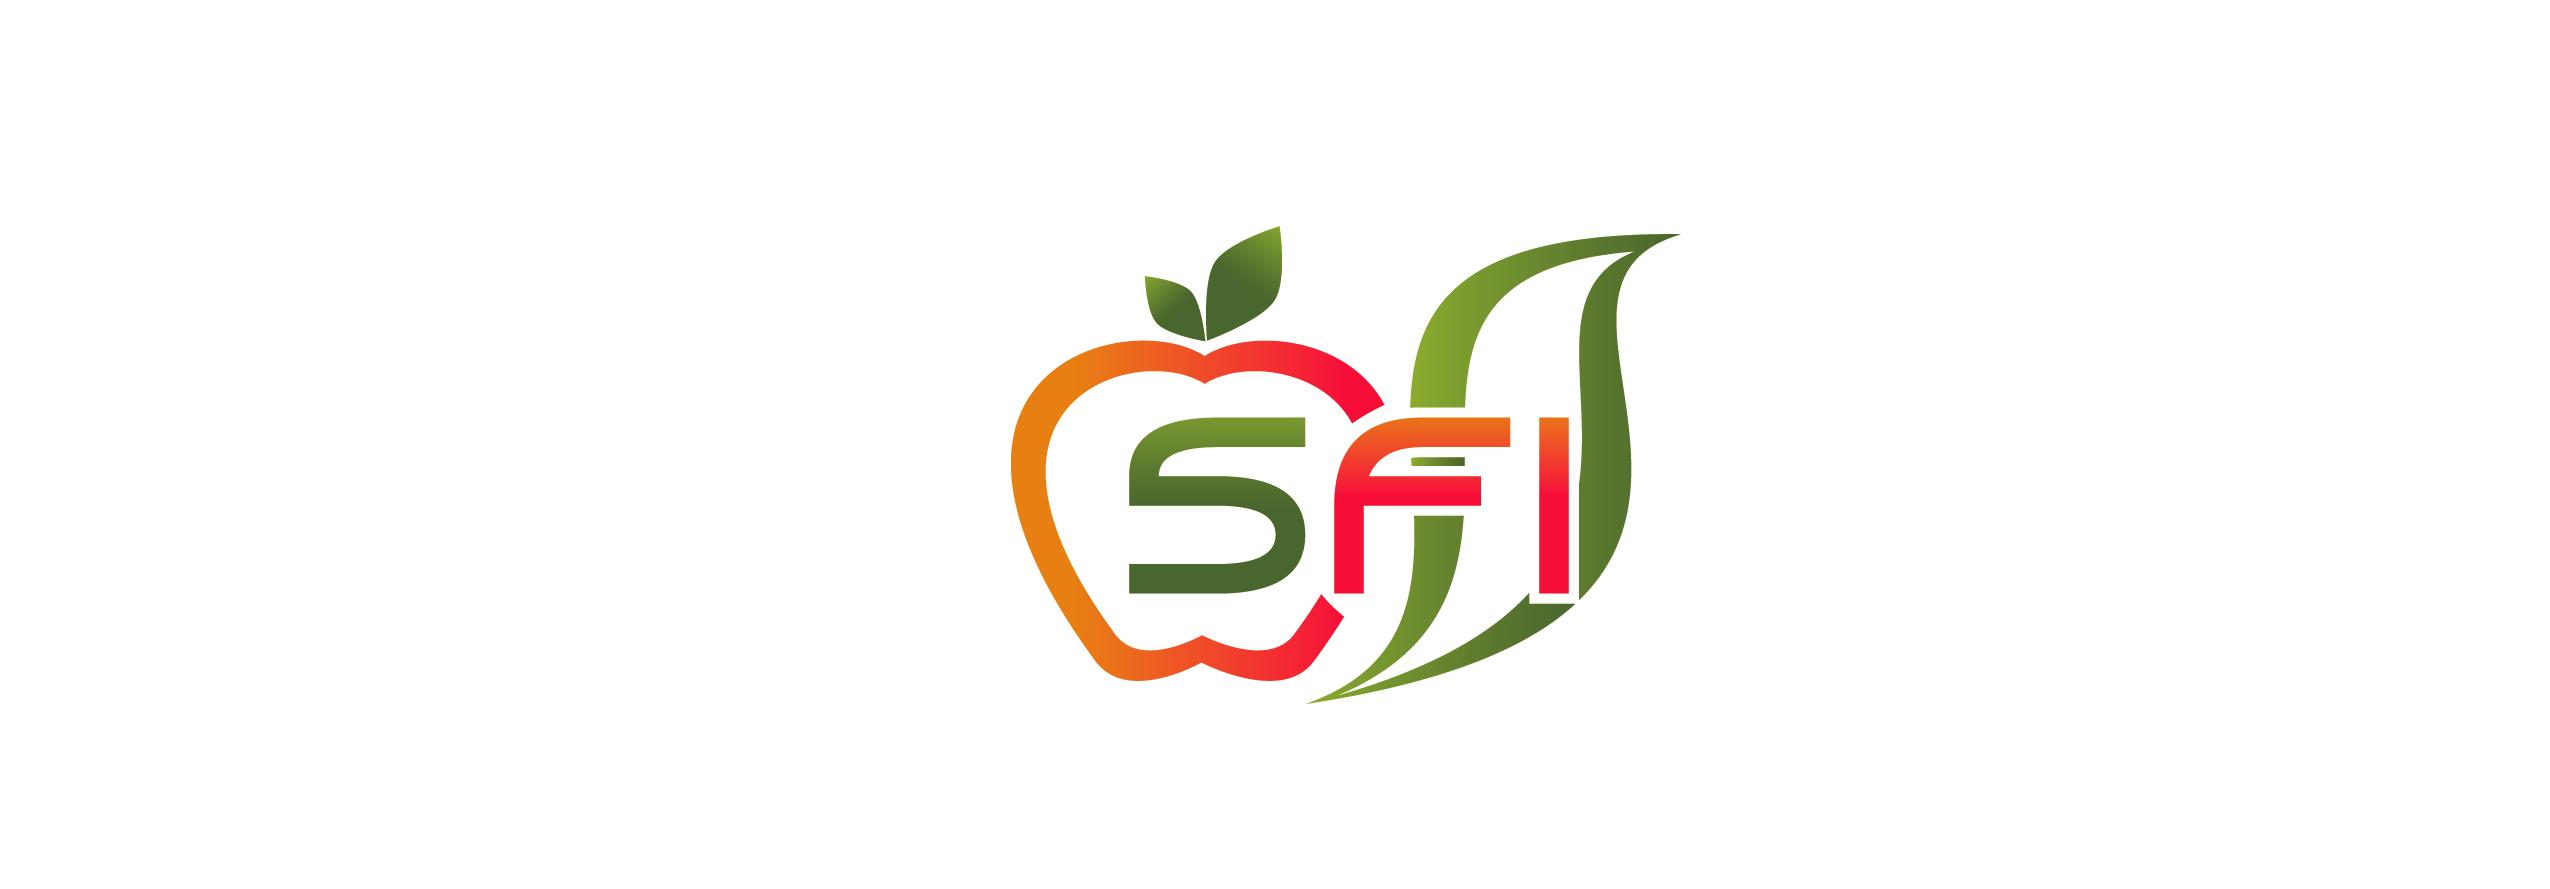 Logo Design by Private User - Entry No. 207 in the Logo Design Contest Inspiring Logo Design for SFI.